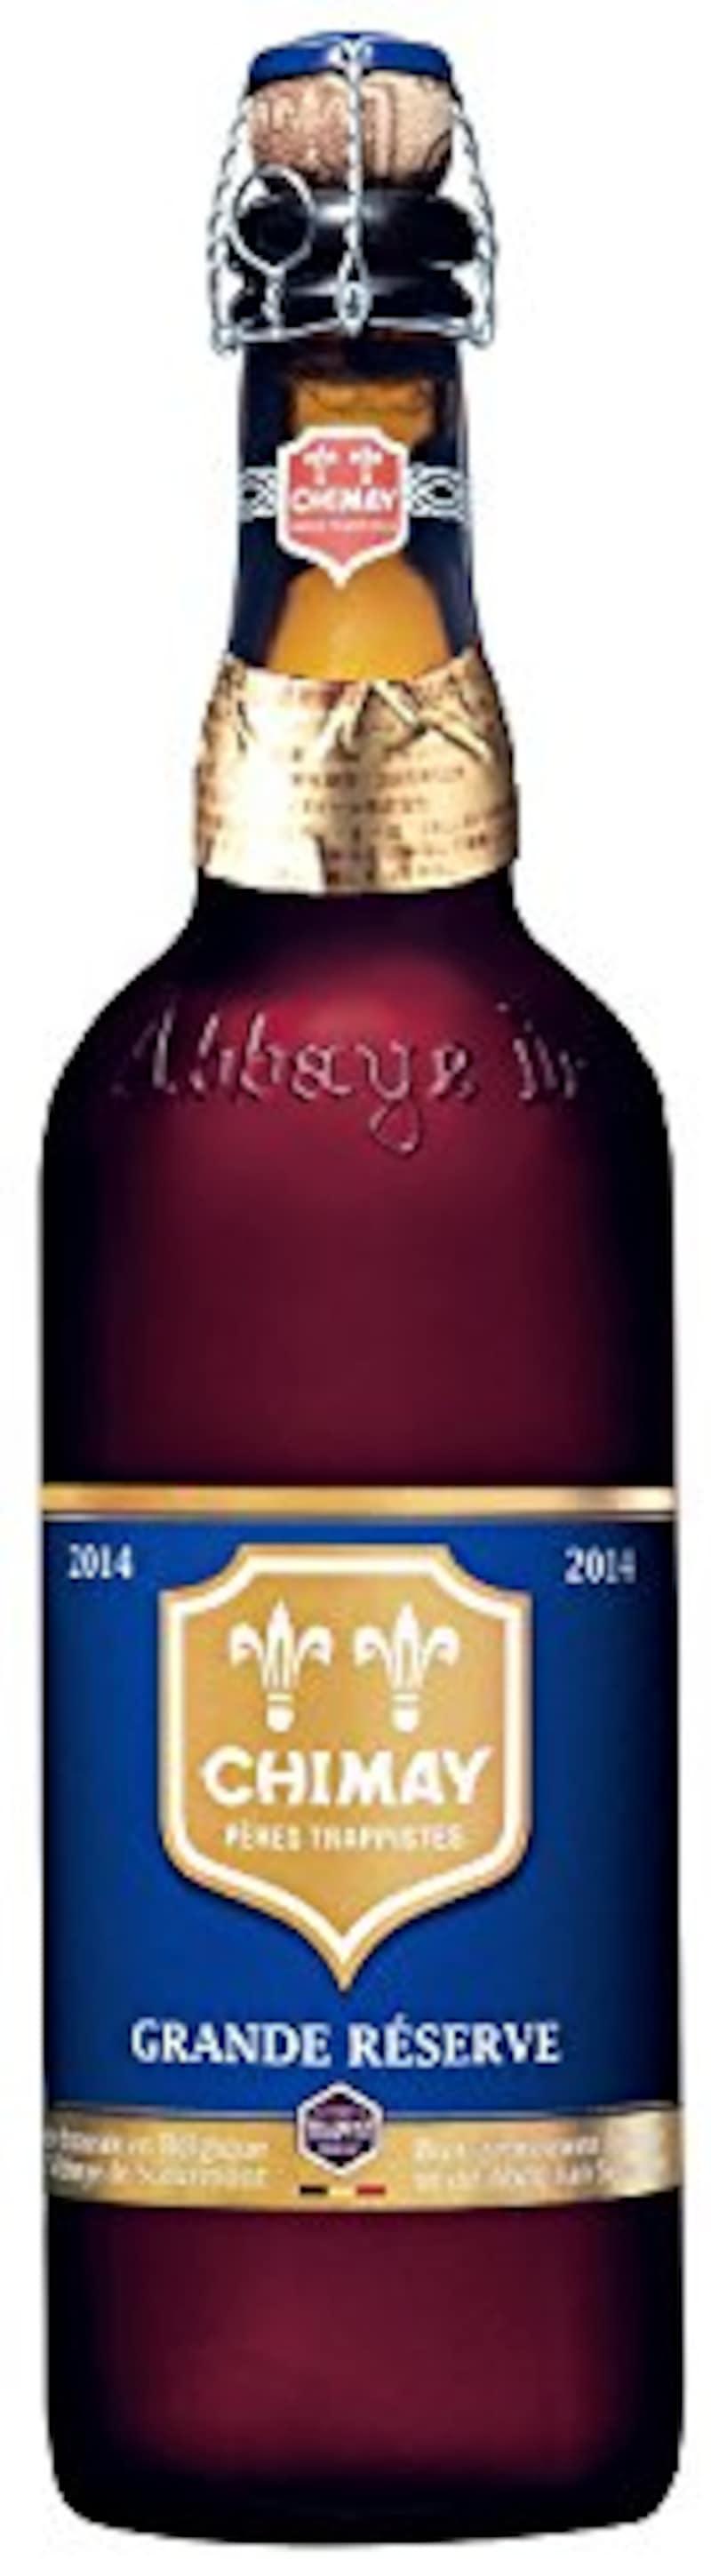 Chimay,シメイ・ブルー 大瓶 750ml,302524-24